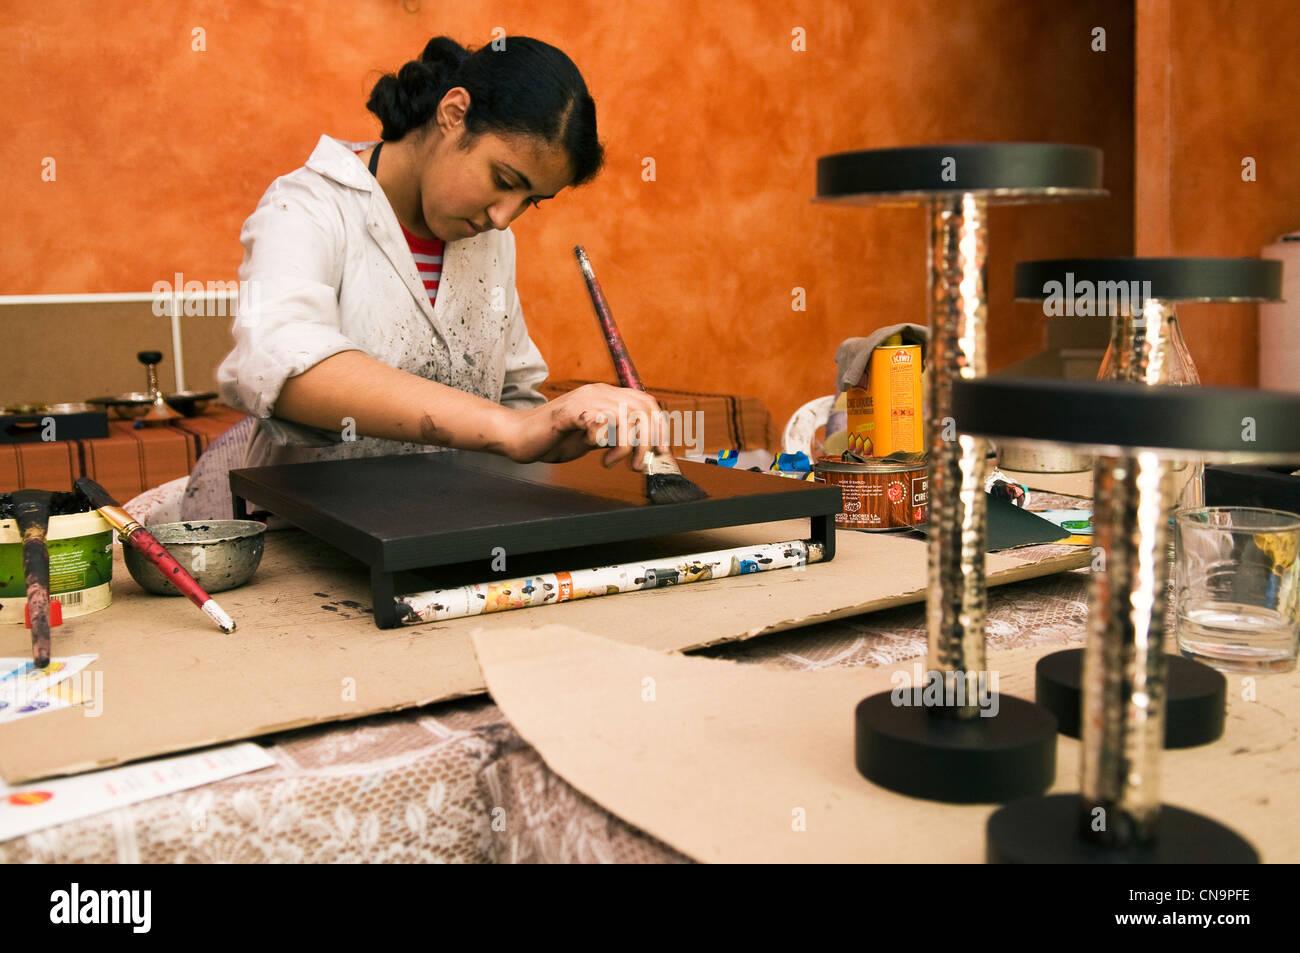 Tunisia, Carthage, studio ceramics and handicrafts - Stock Image